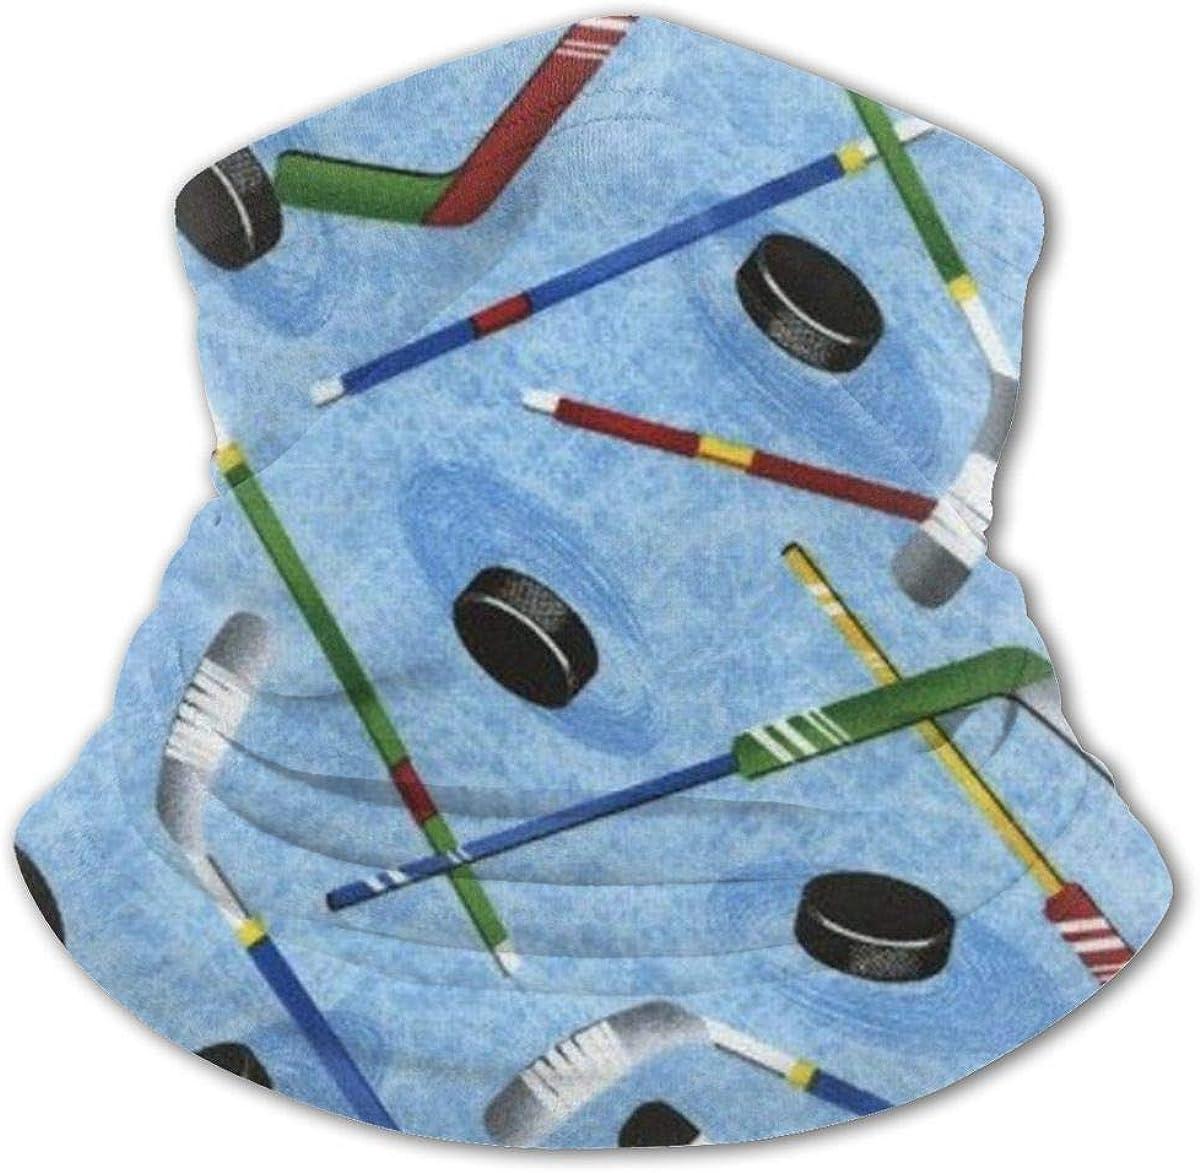 Hockey Sticks Headwear For Girls And Boys, Head Wrap, Neck Gaiter, Headband, Tenn Fishing Mask, Magic Scarf, Tube Mask, Face Bandana Mask For Camping Running Cycling